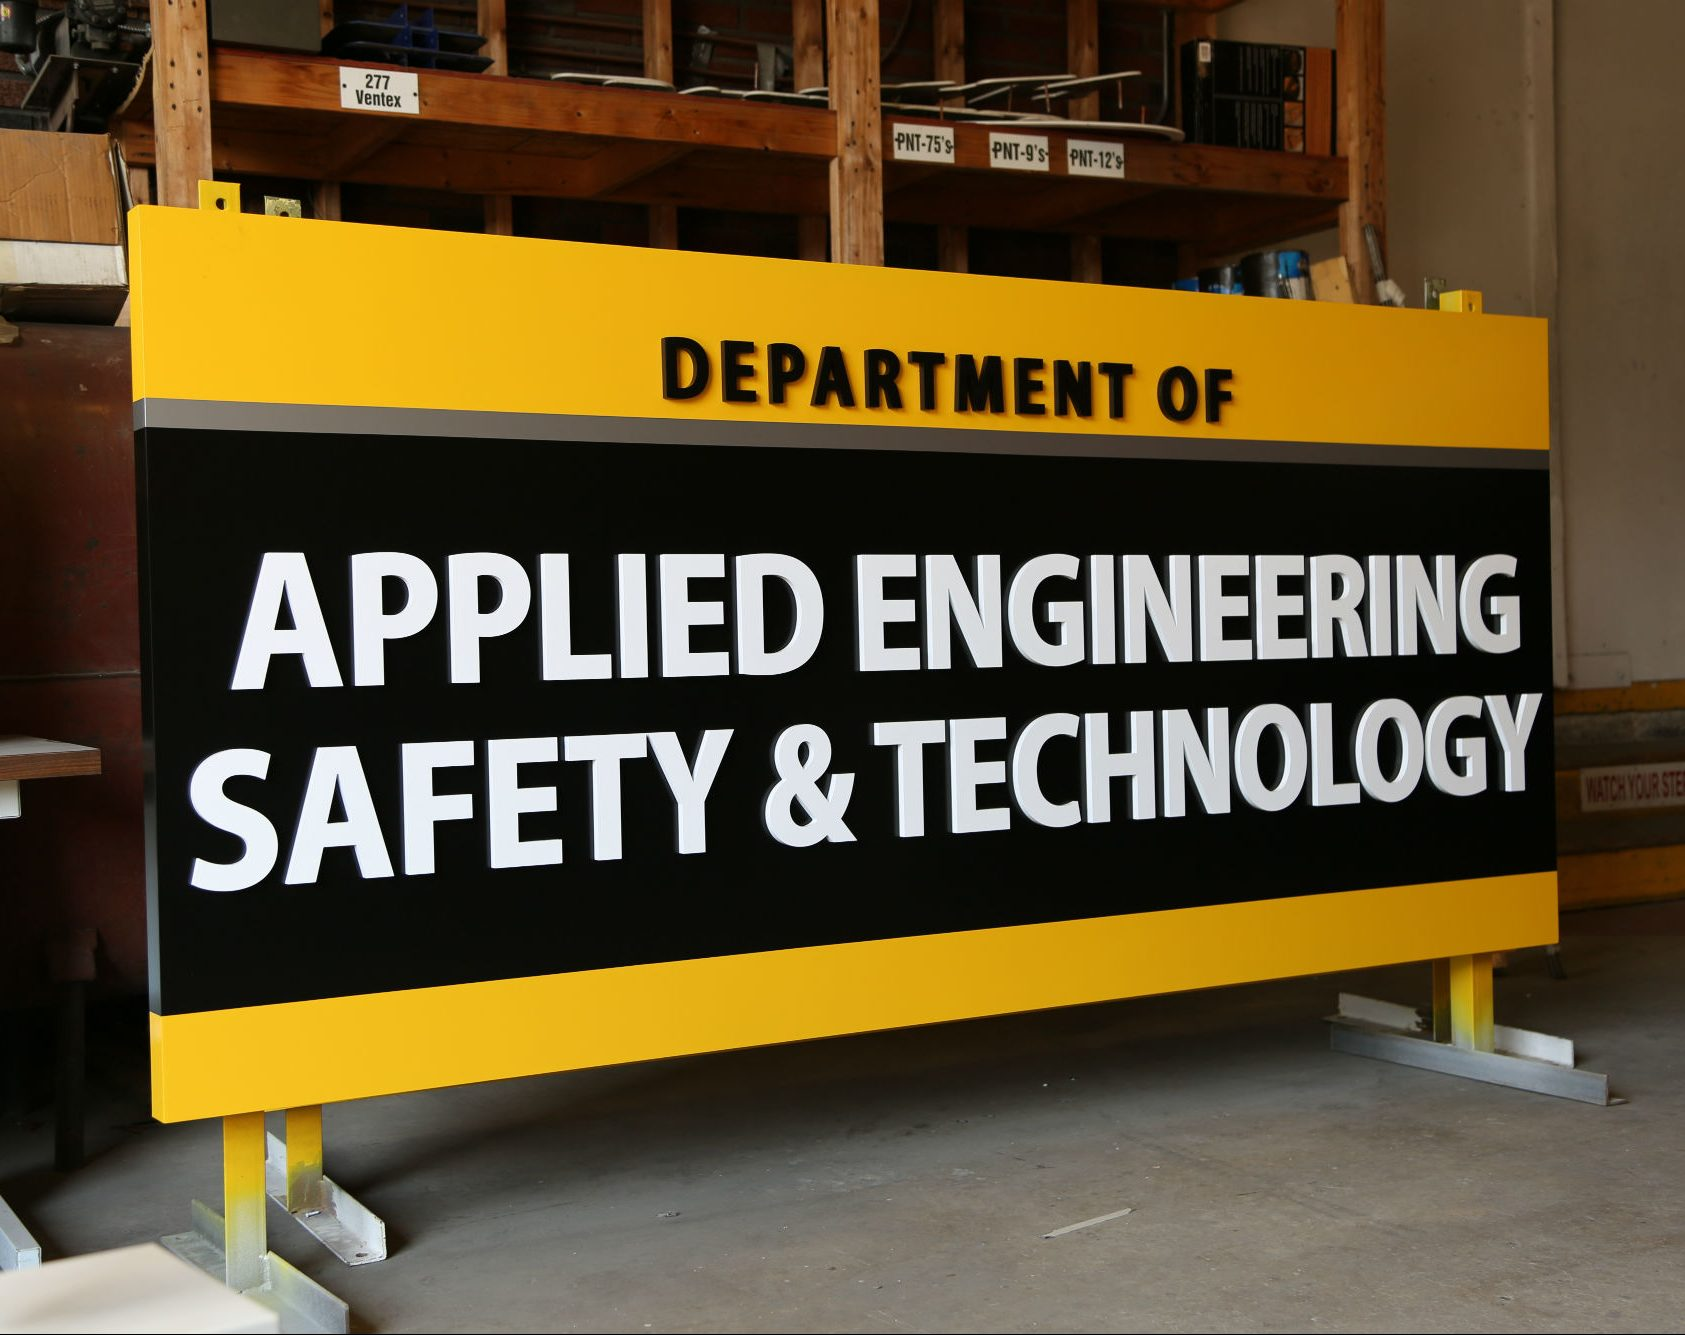 millersville applied engineering school sign